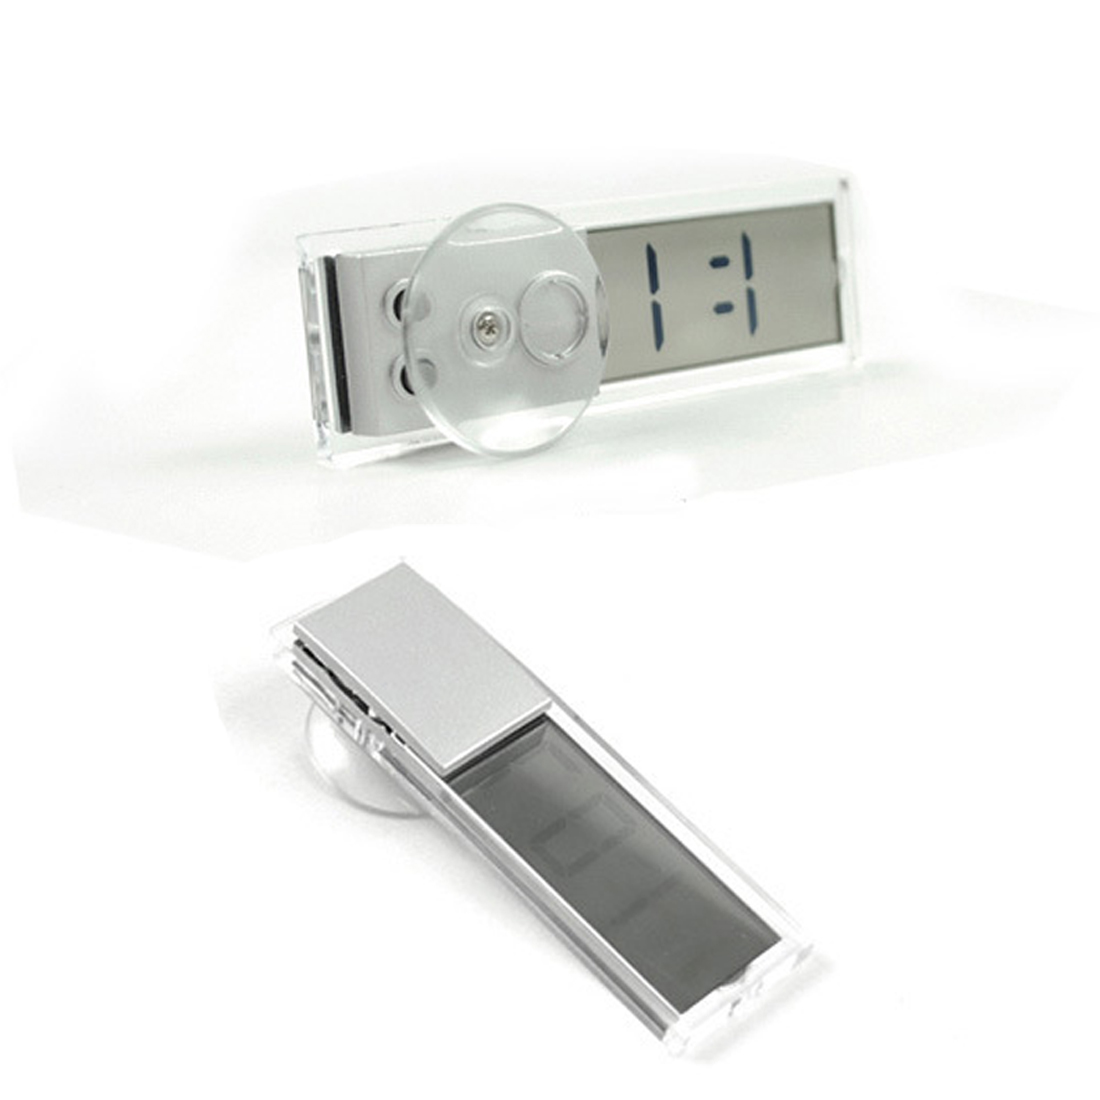 Dewtreetali  Car Electronic Transparent Clock Schedule with Sucker Mini Digital LCD Display Automotive Interior Accessories